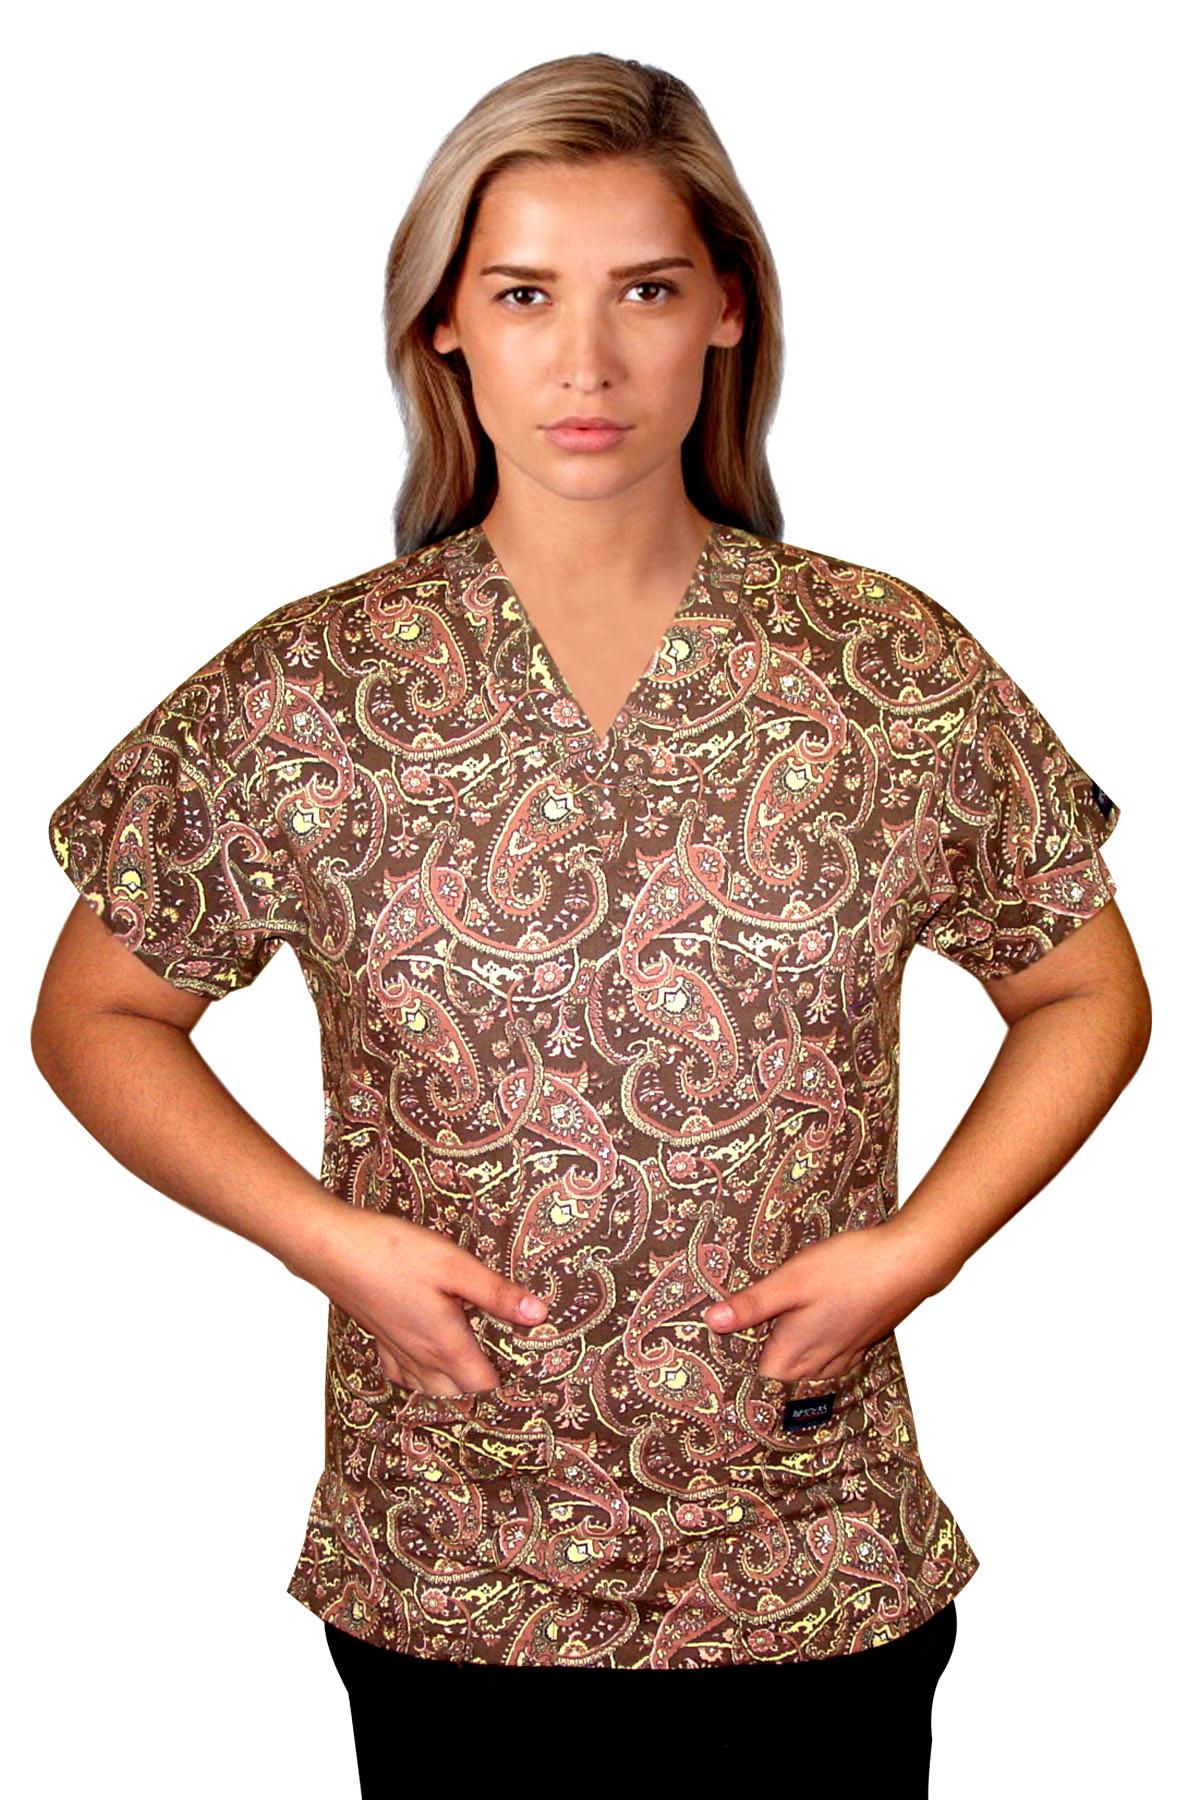 Printed scrub set 4 pocket ladies half sleeve in brown daisy print (2 pocket top and 2 pocket pant)